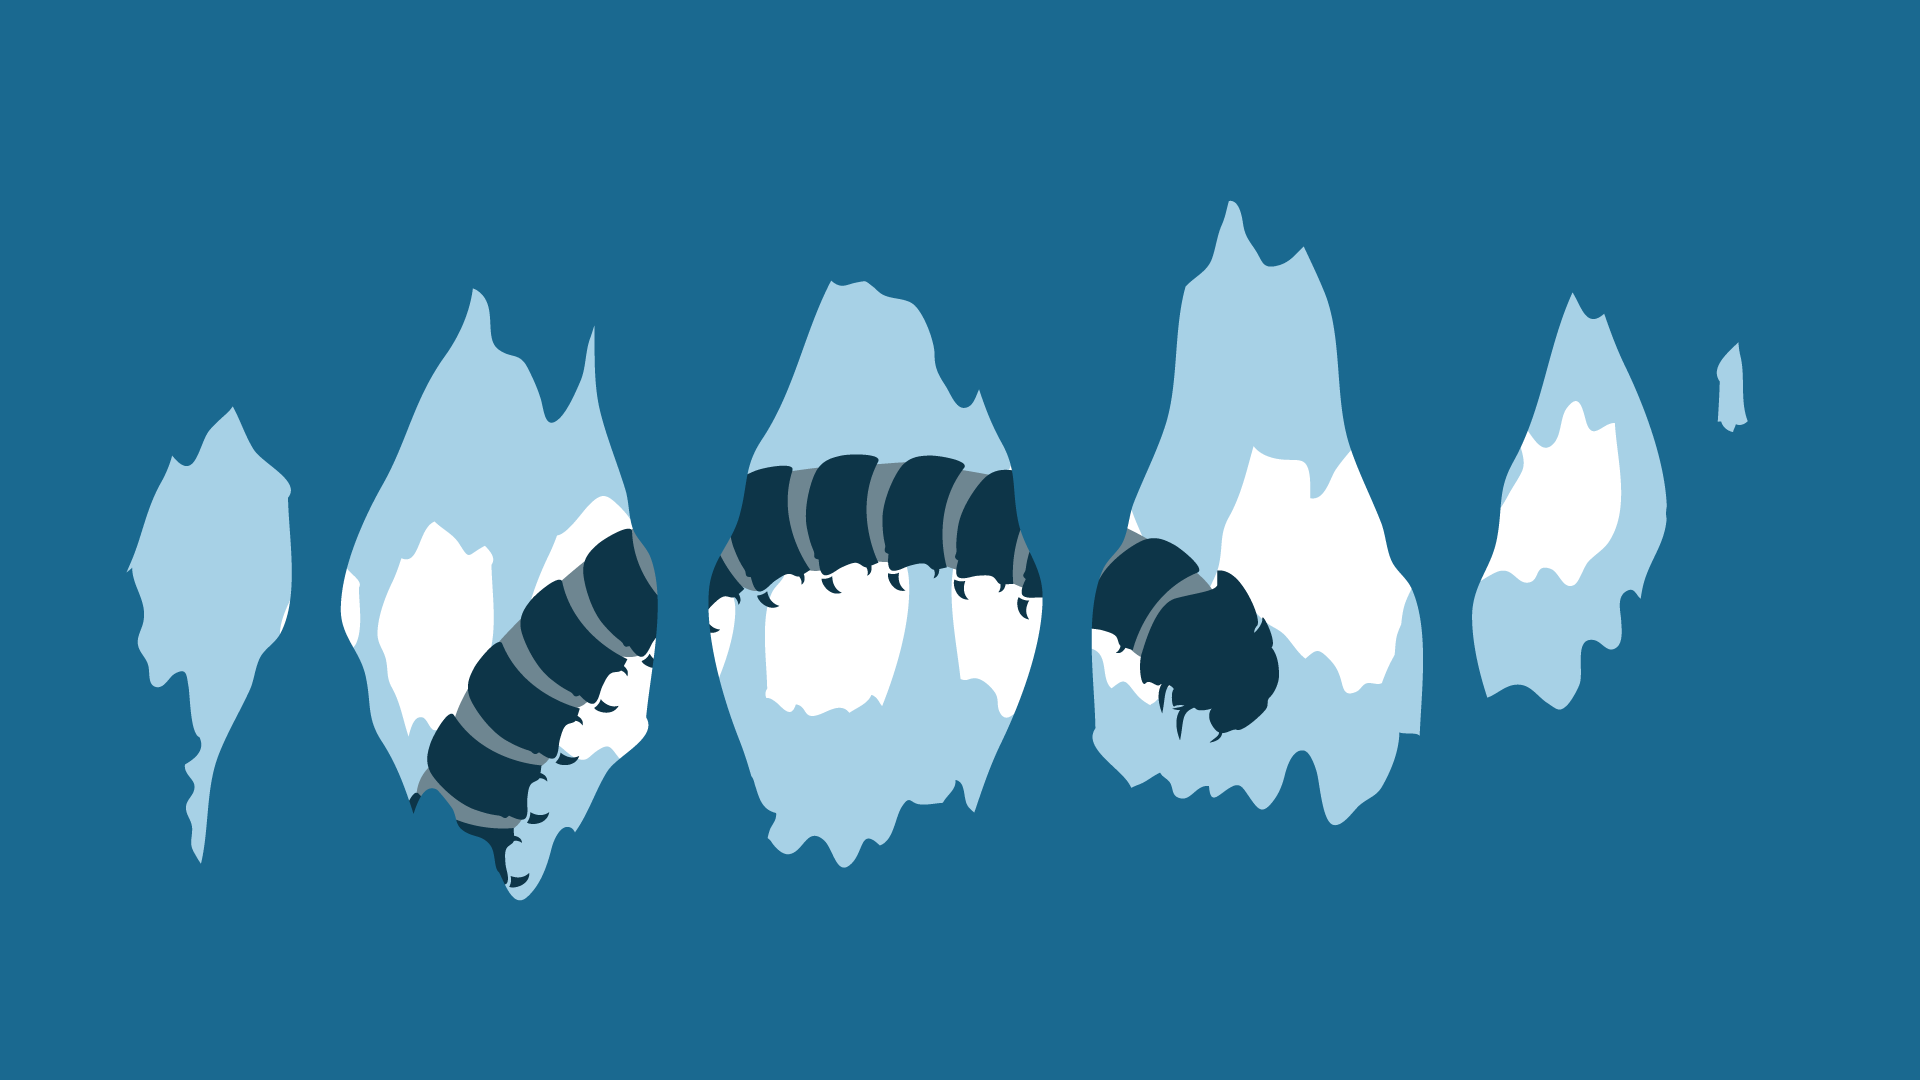 lvl1-02.png